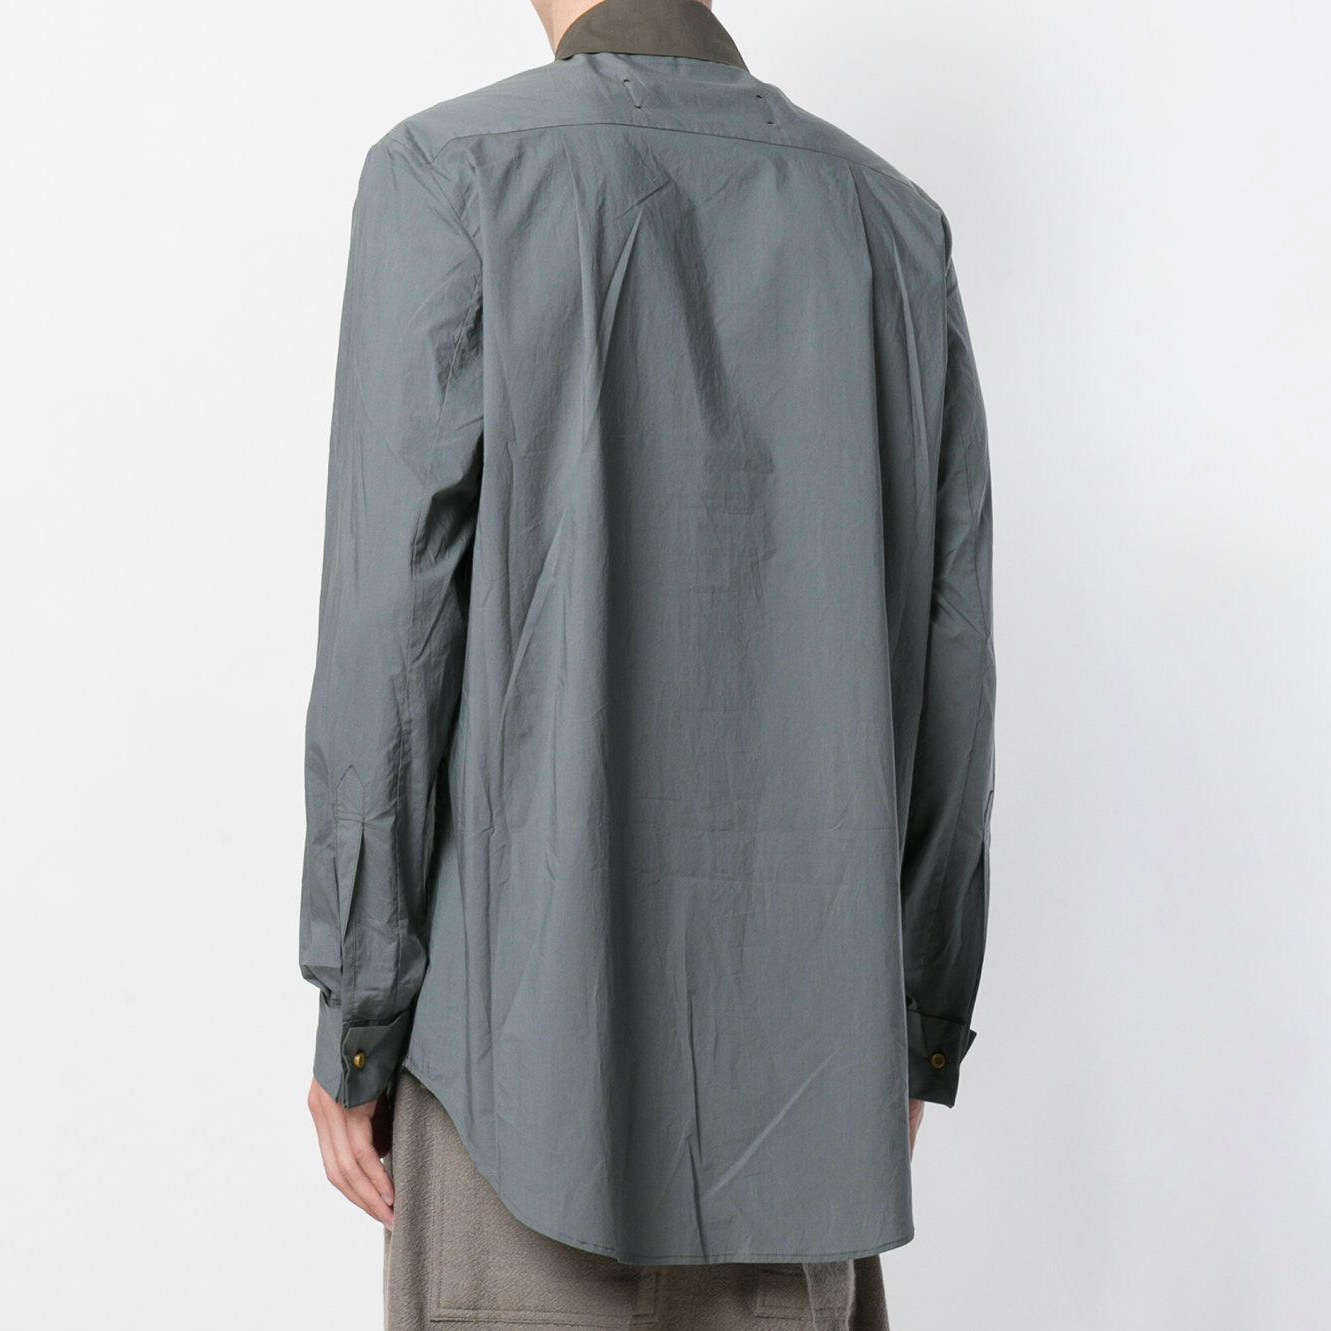 uma-wang-Green-Contrast-Fitted-Shirt (1).jpg